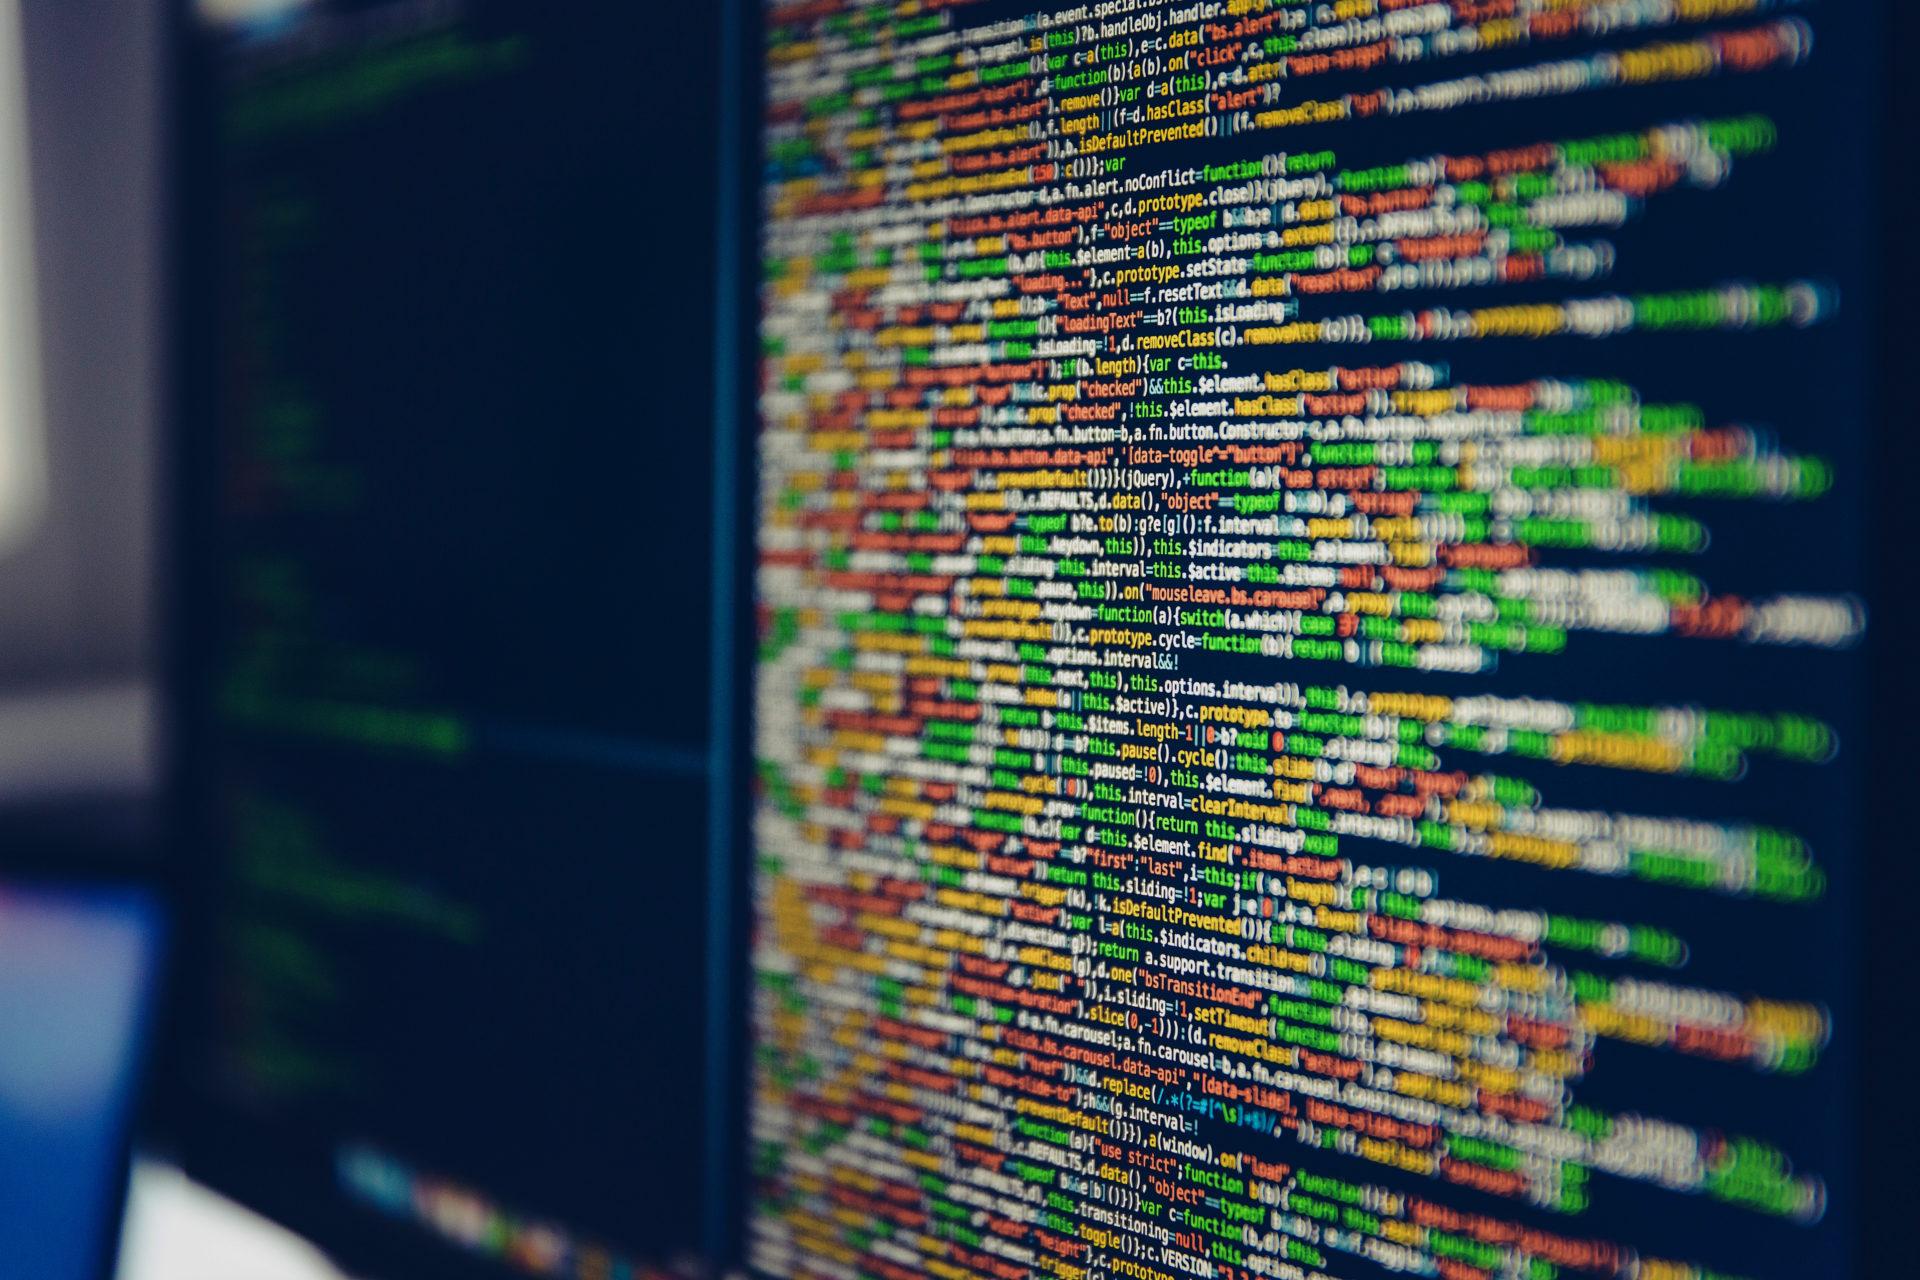 data code on a computer screen